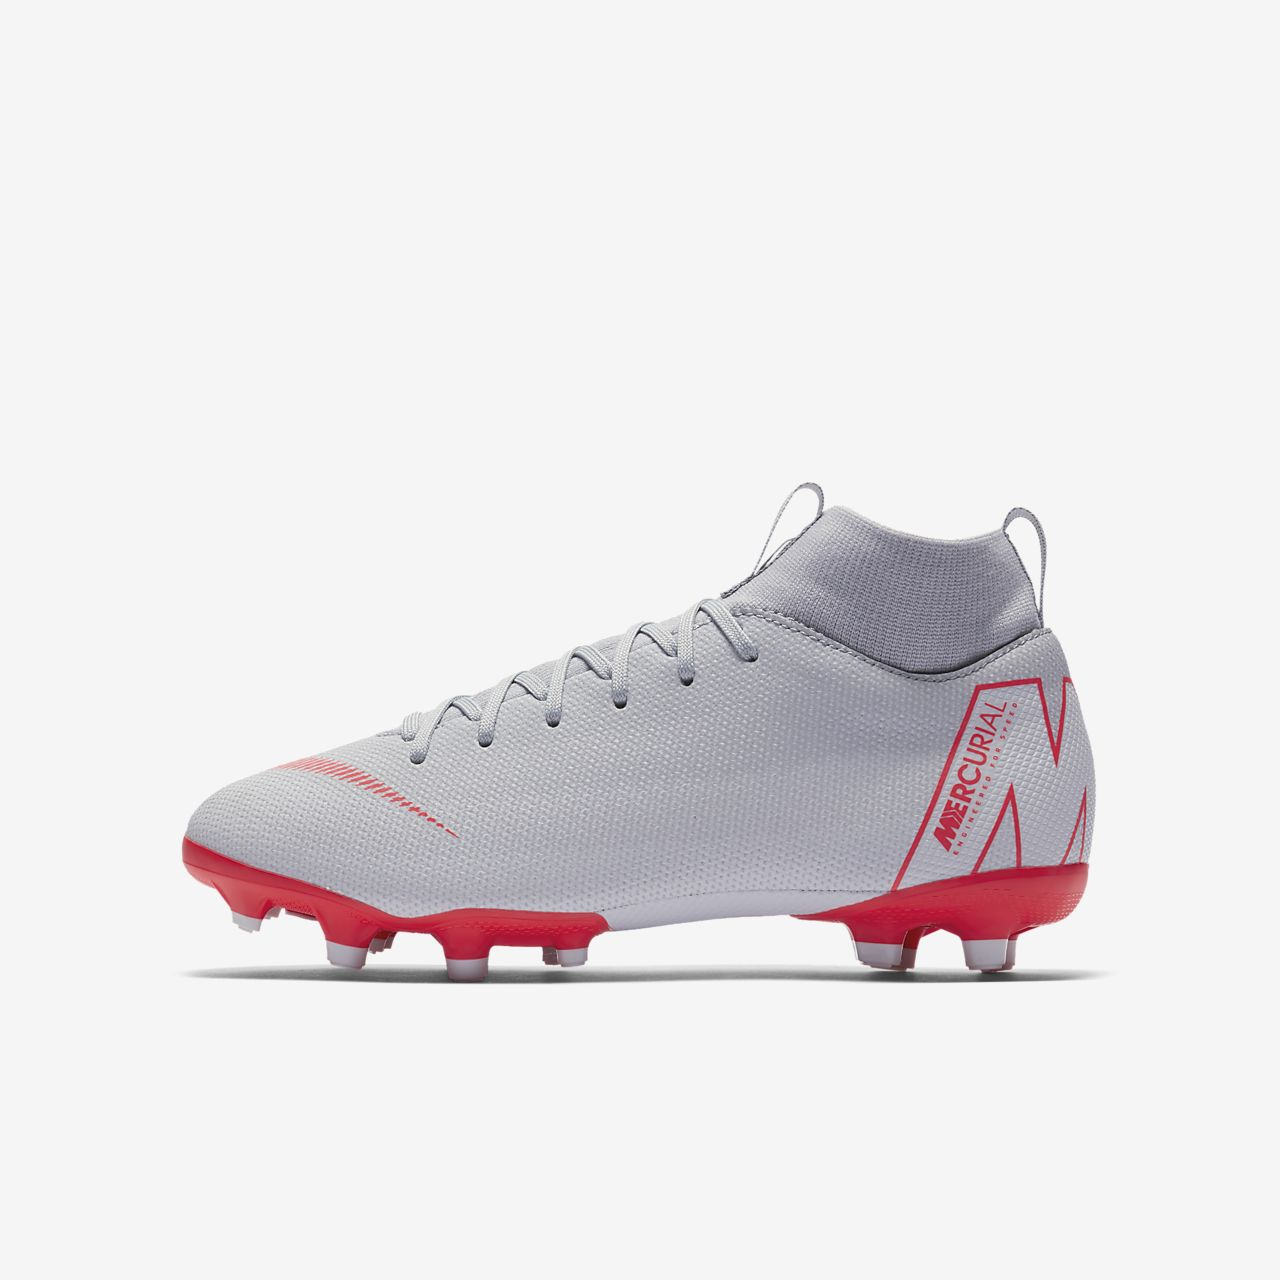 Scarpa da calcio multiterreno Nike Mercurial Superfly 6